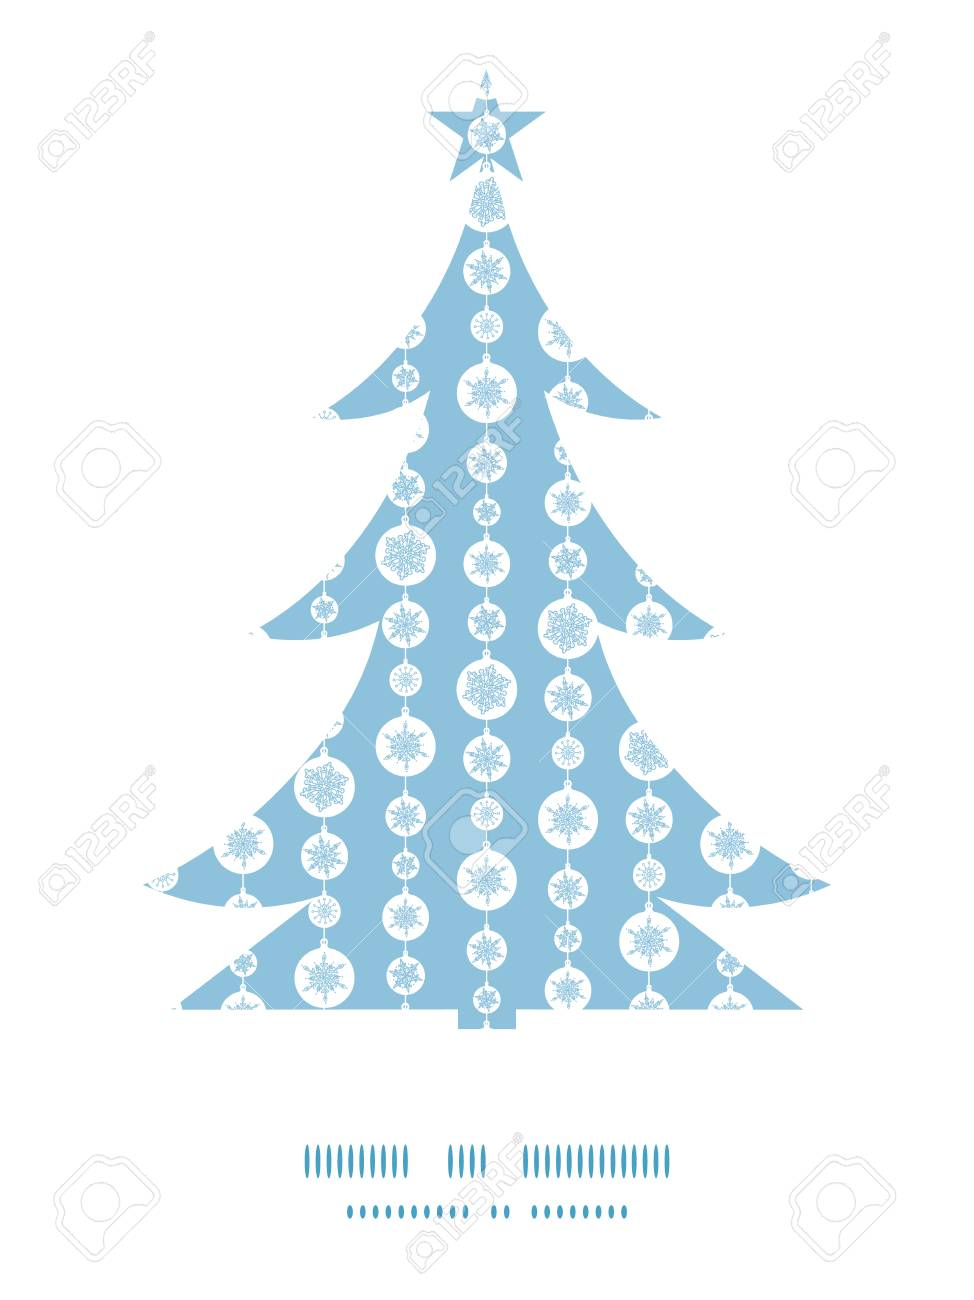 Erfreut Rahmen Weihnachtsbaum Ideen - Rahmen Ideen - markjohnsonshow ...